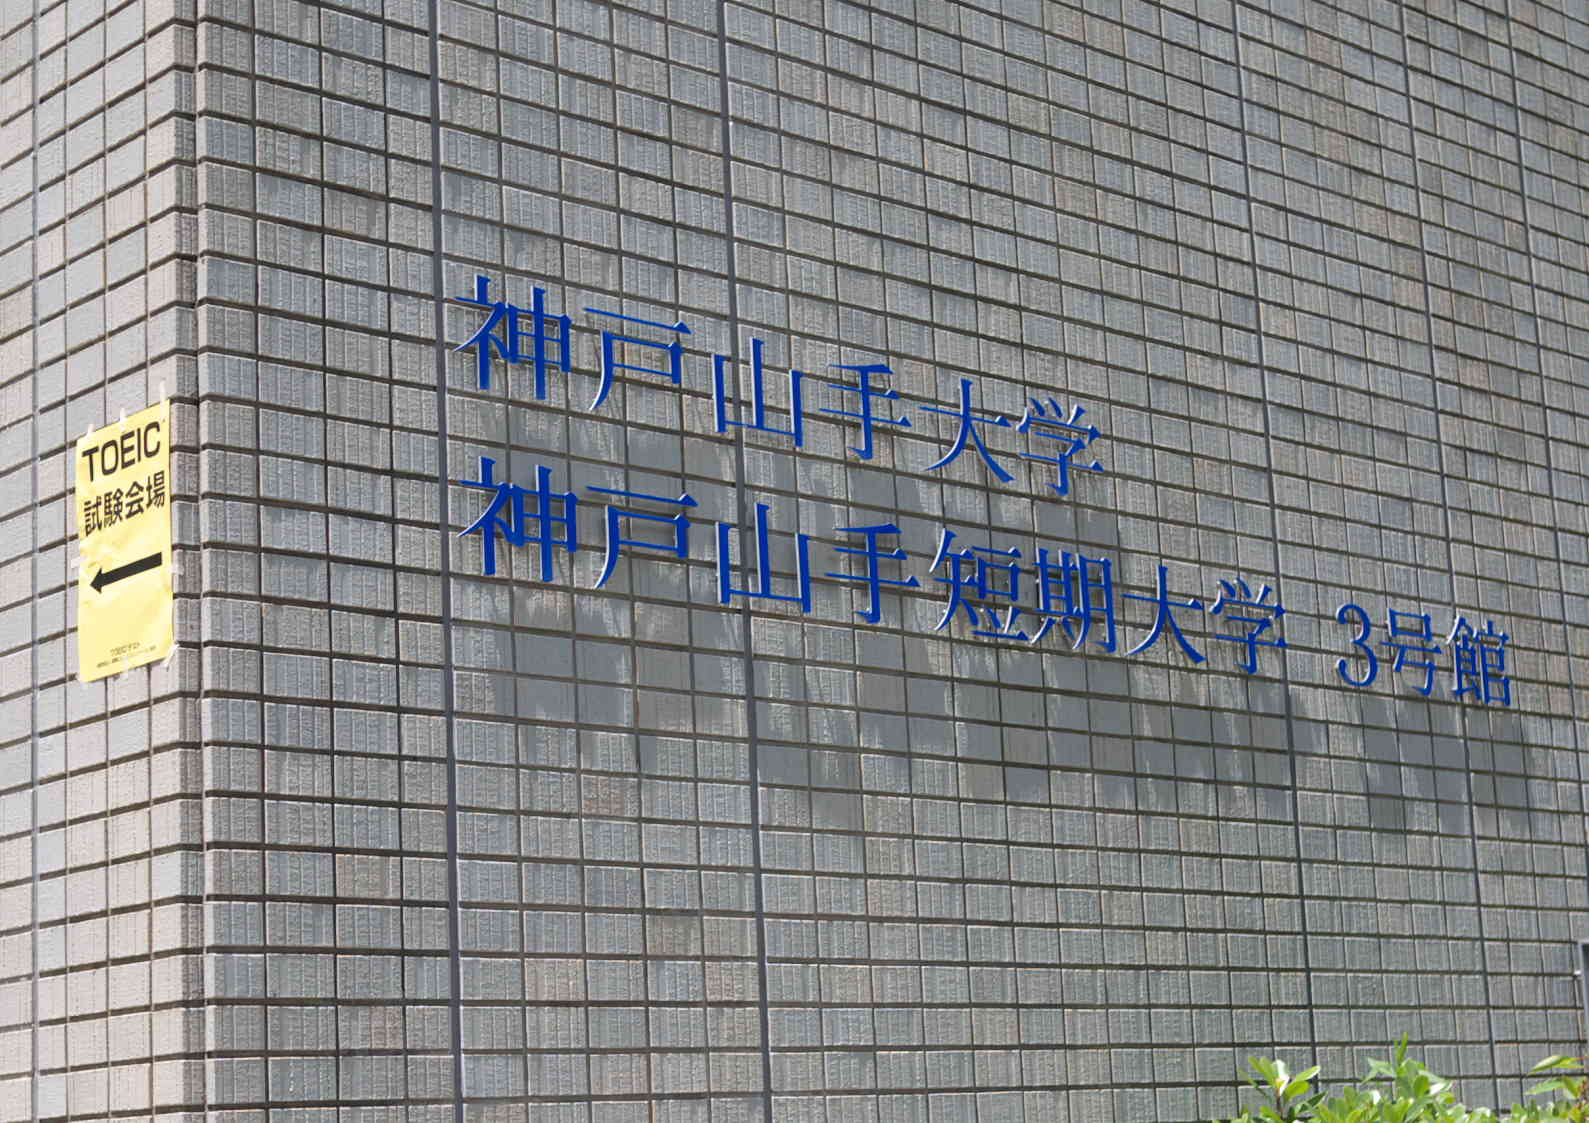 20150524_toeic.jpg